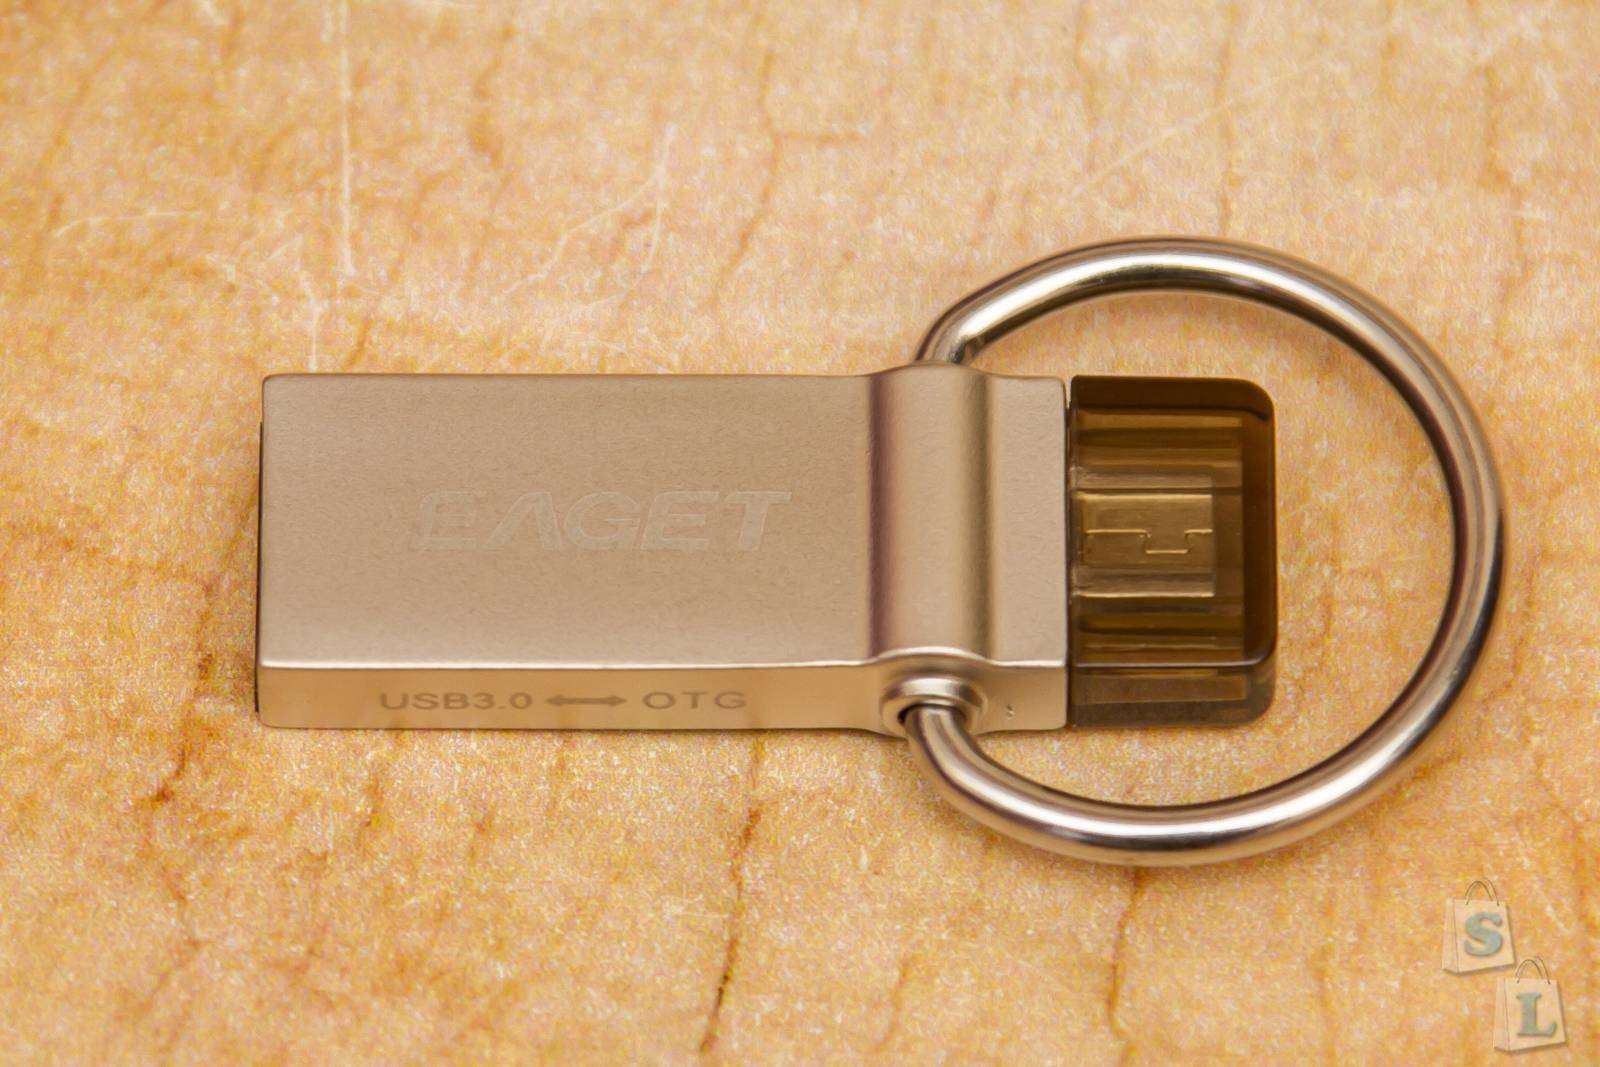 GearBest: Удобная флешка USB 3.0 Eaget 16GB с OTG